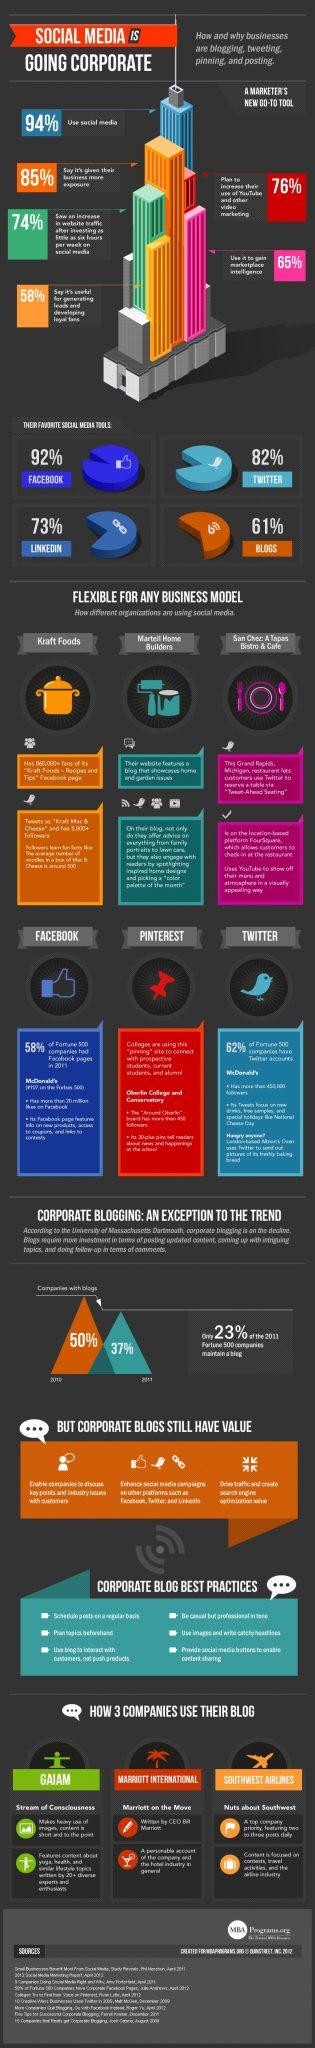 Social Media Corporate Brand Strategy